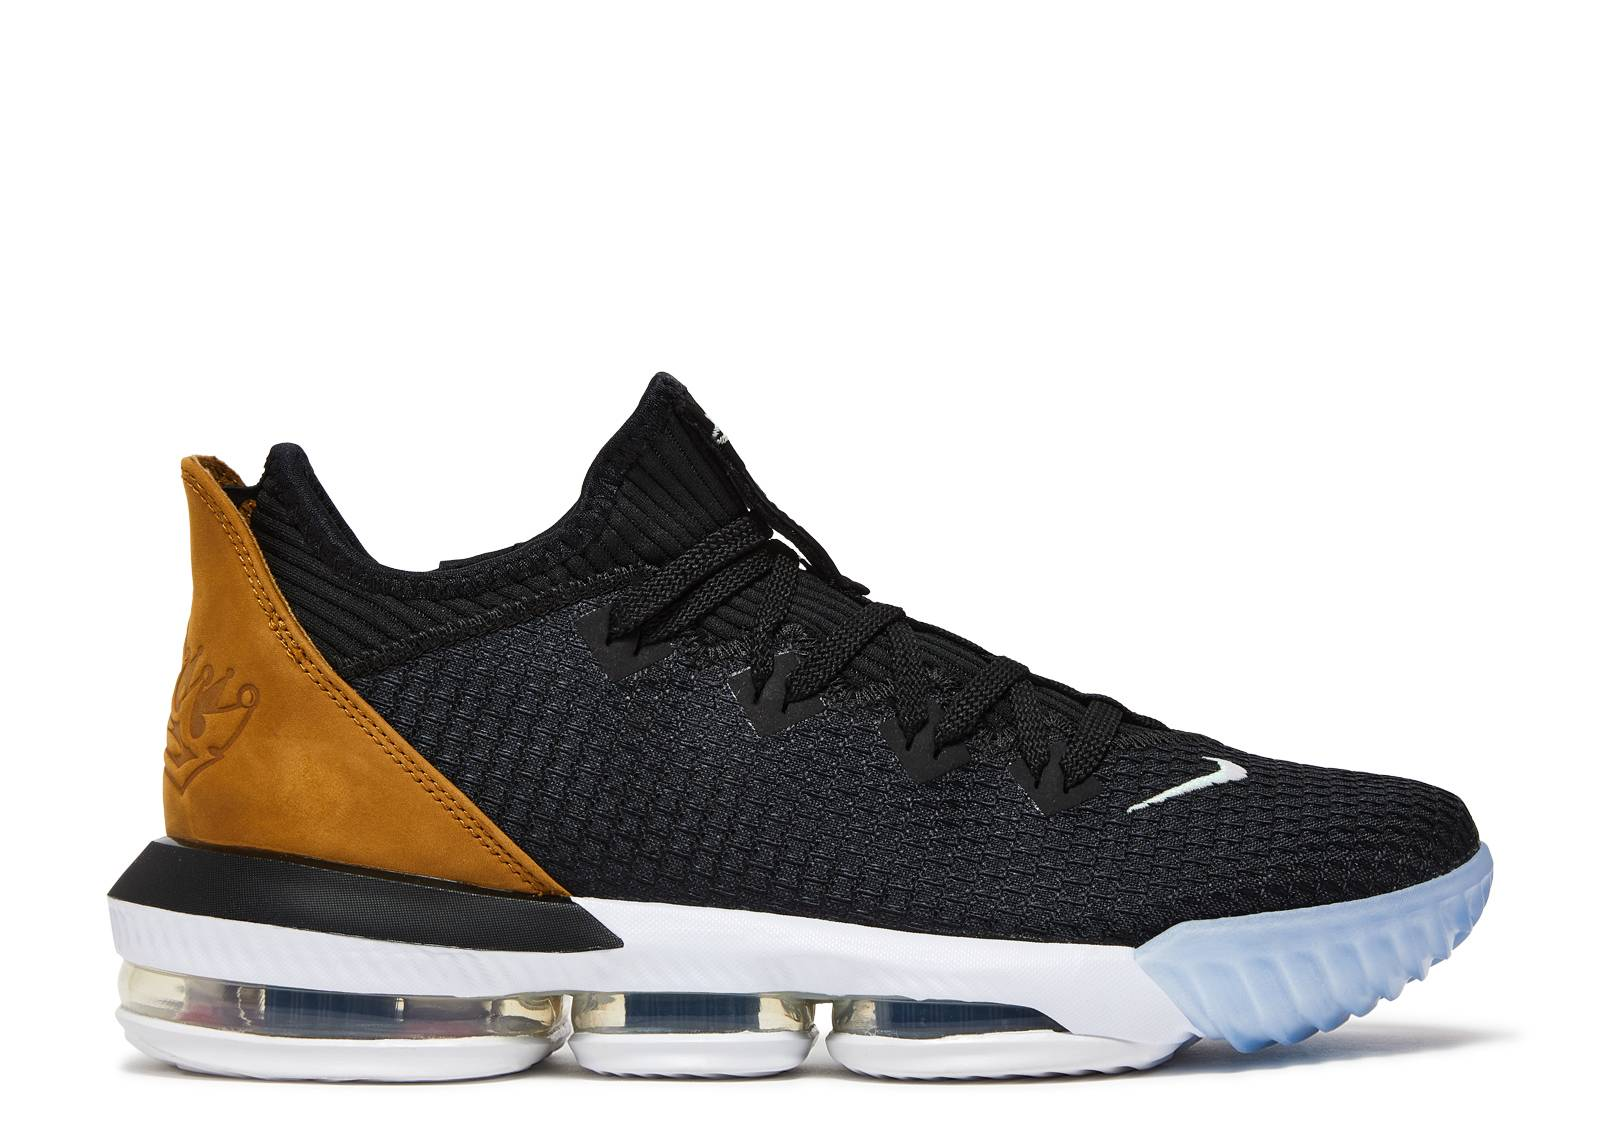 pretty nice 214d5 1dab1 Nike LeBron 16 Low